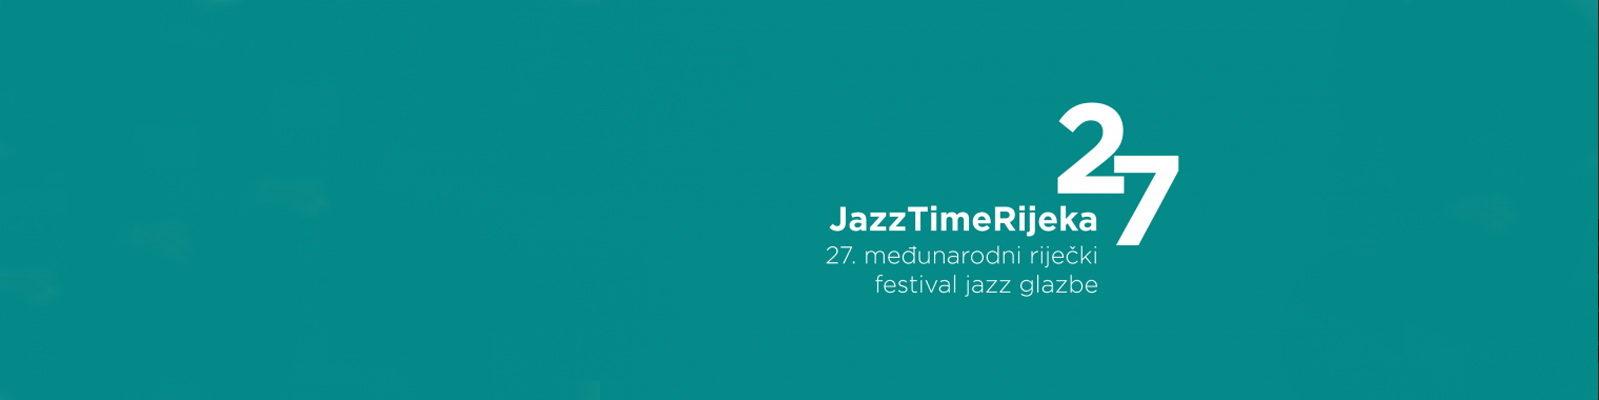 27. Jazz Time Rijeka